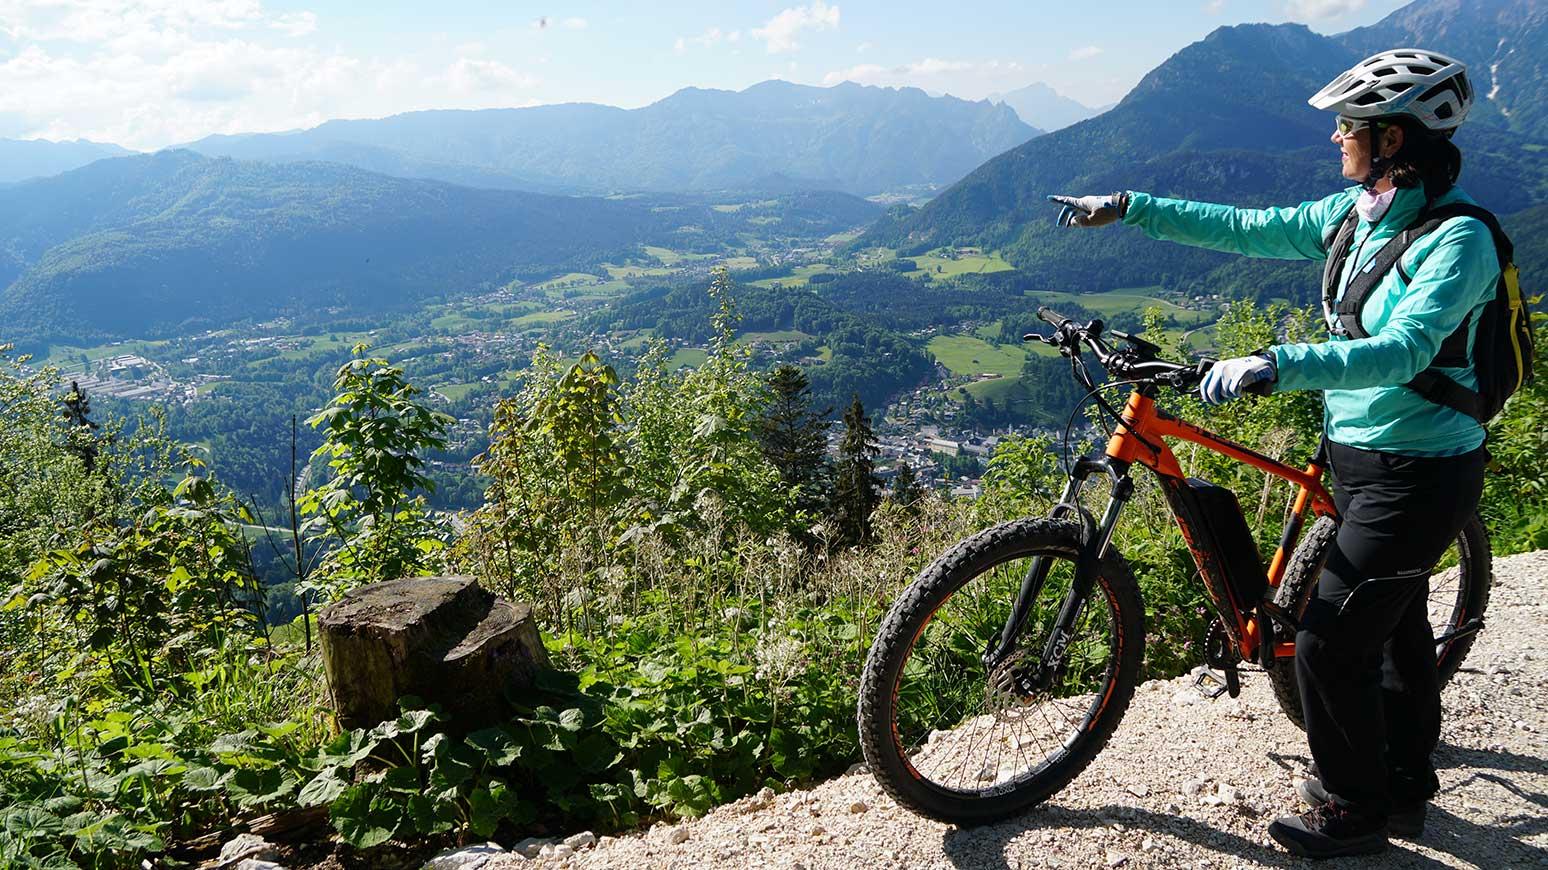 E-Bike fahren im Berchtesgadener Land: Touren um Königssee, Watzmann ...